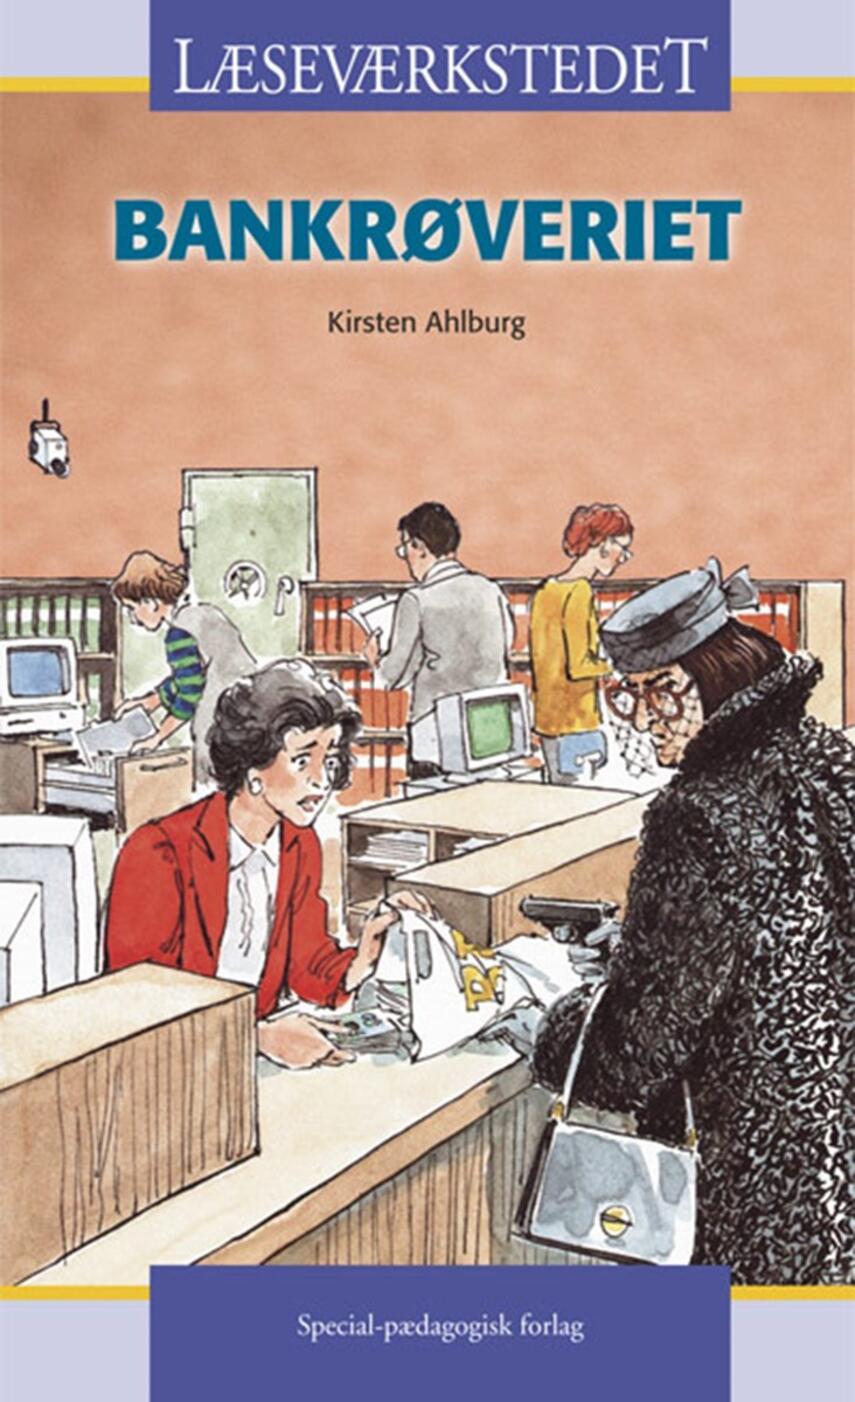 Kirsten Ahlburg: Bankrøveriet